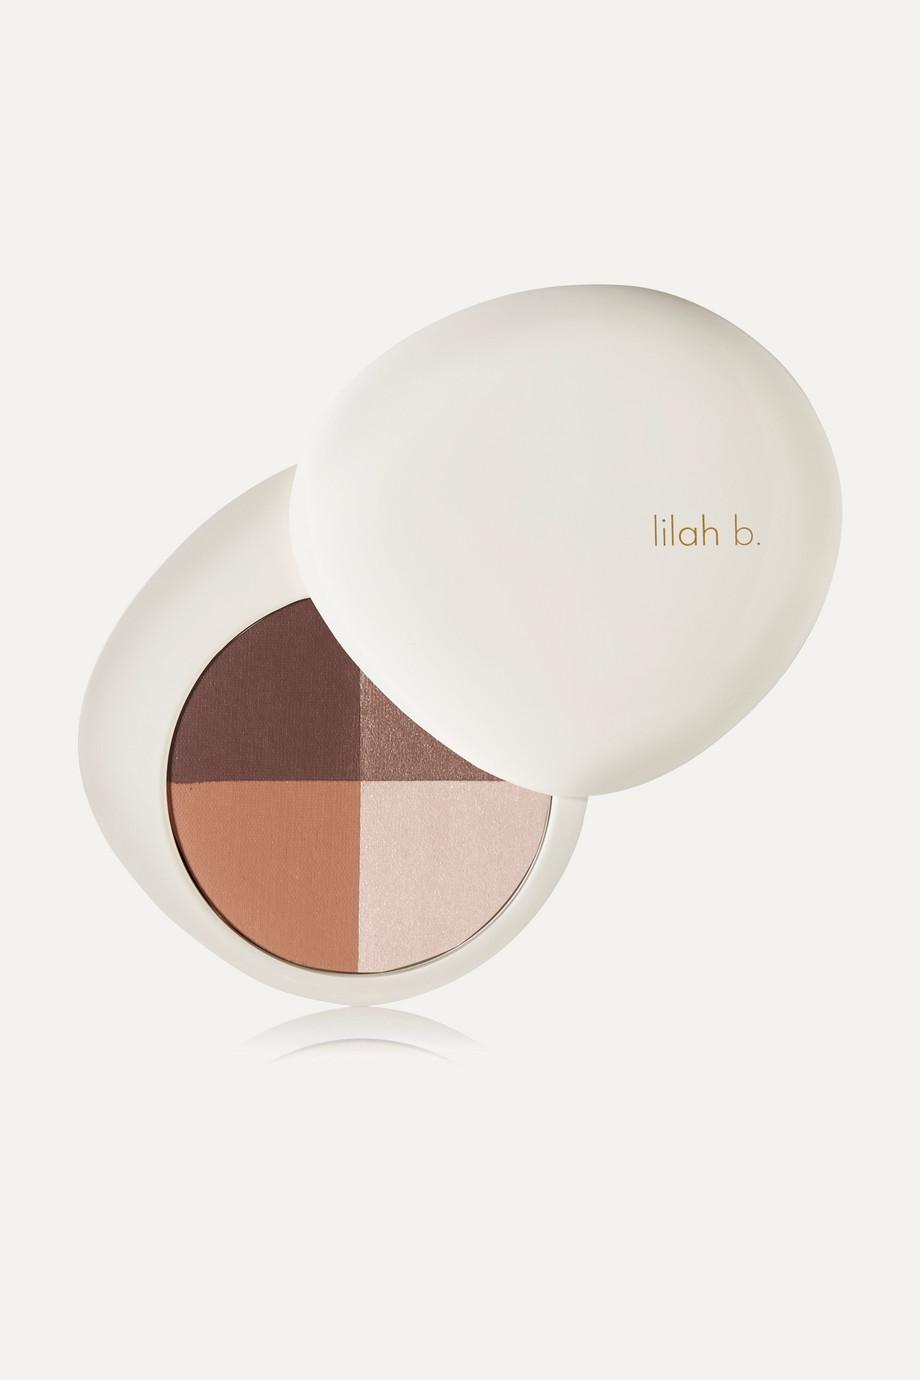 Lilah B. Palette Perfection Eye Quad - b.alluring